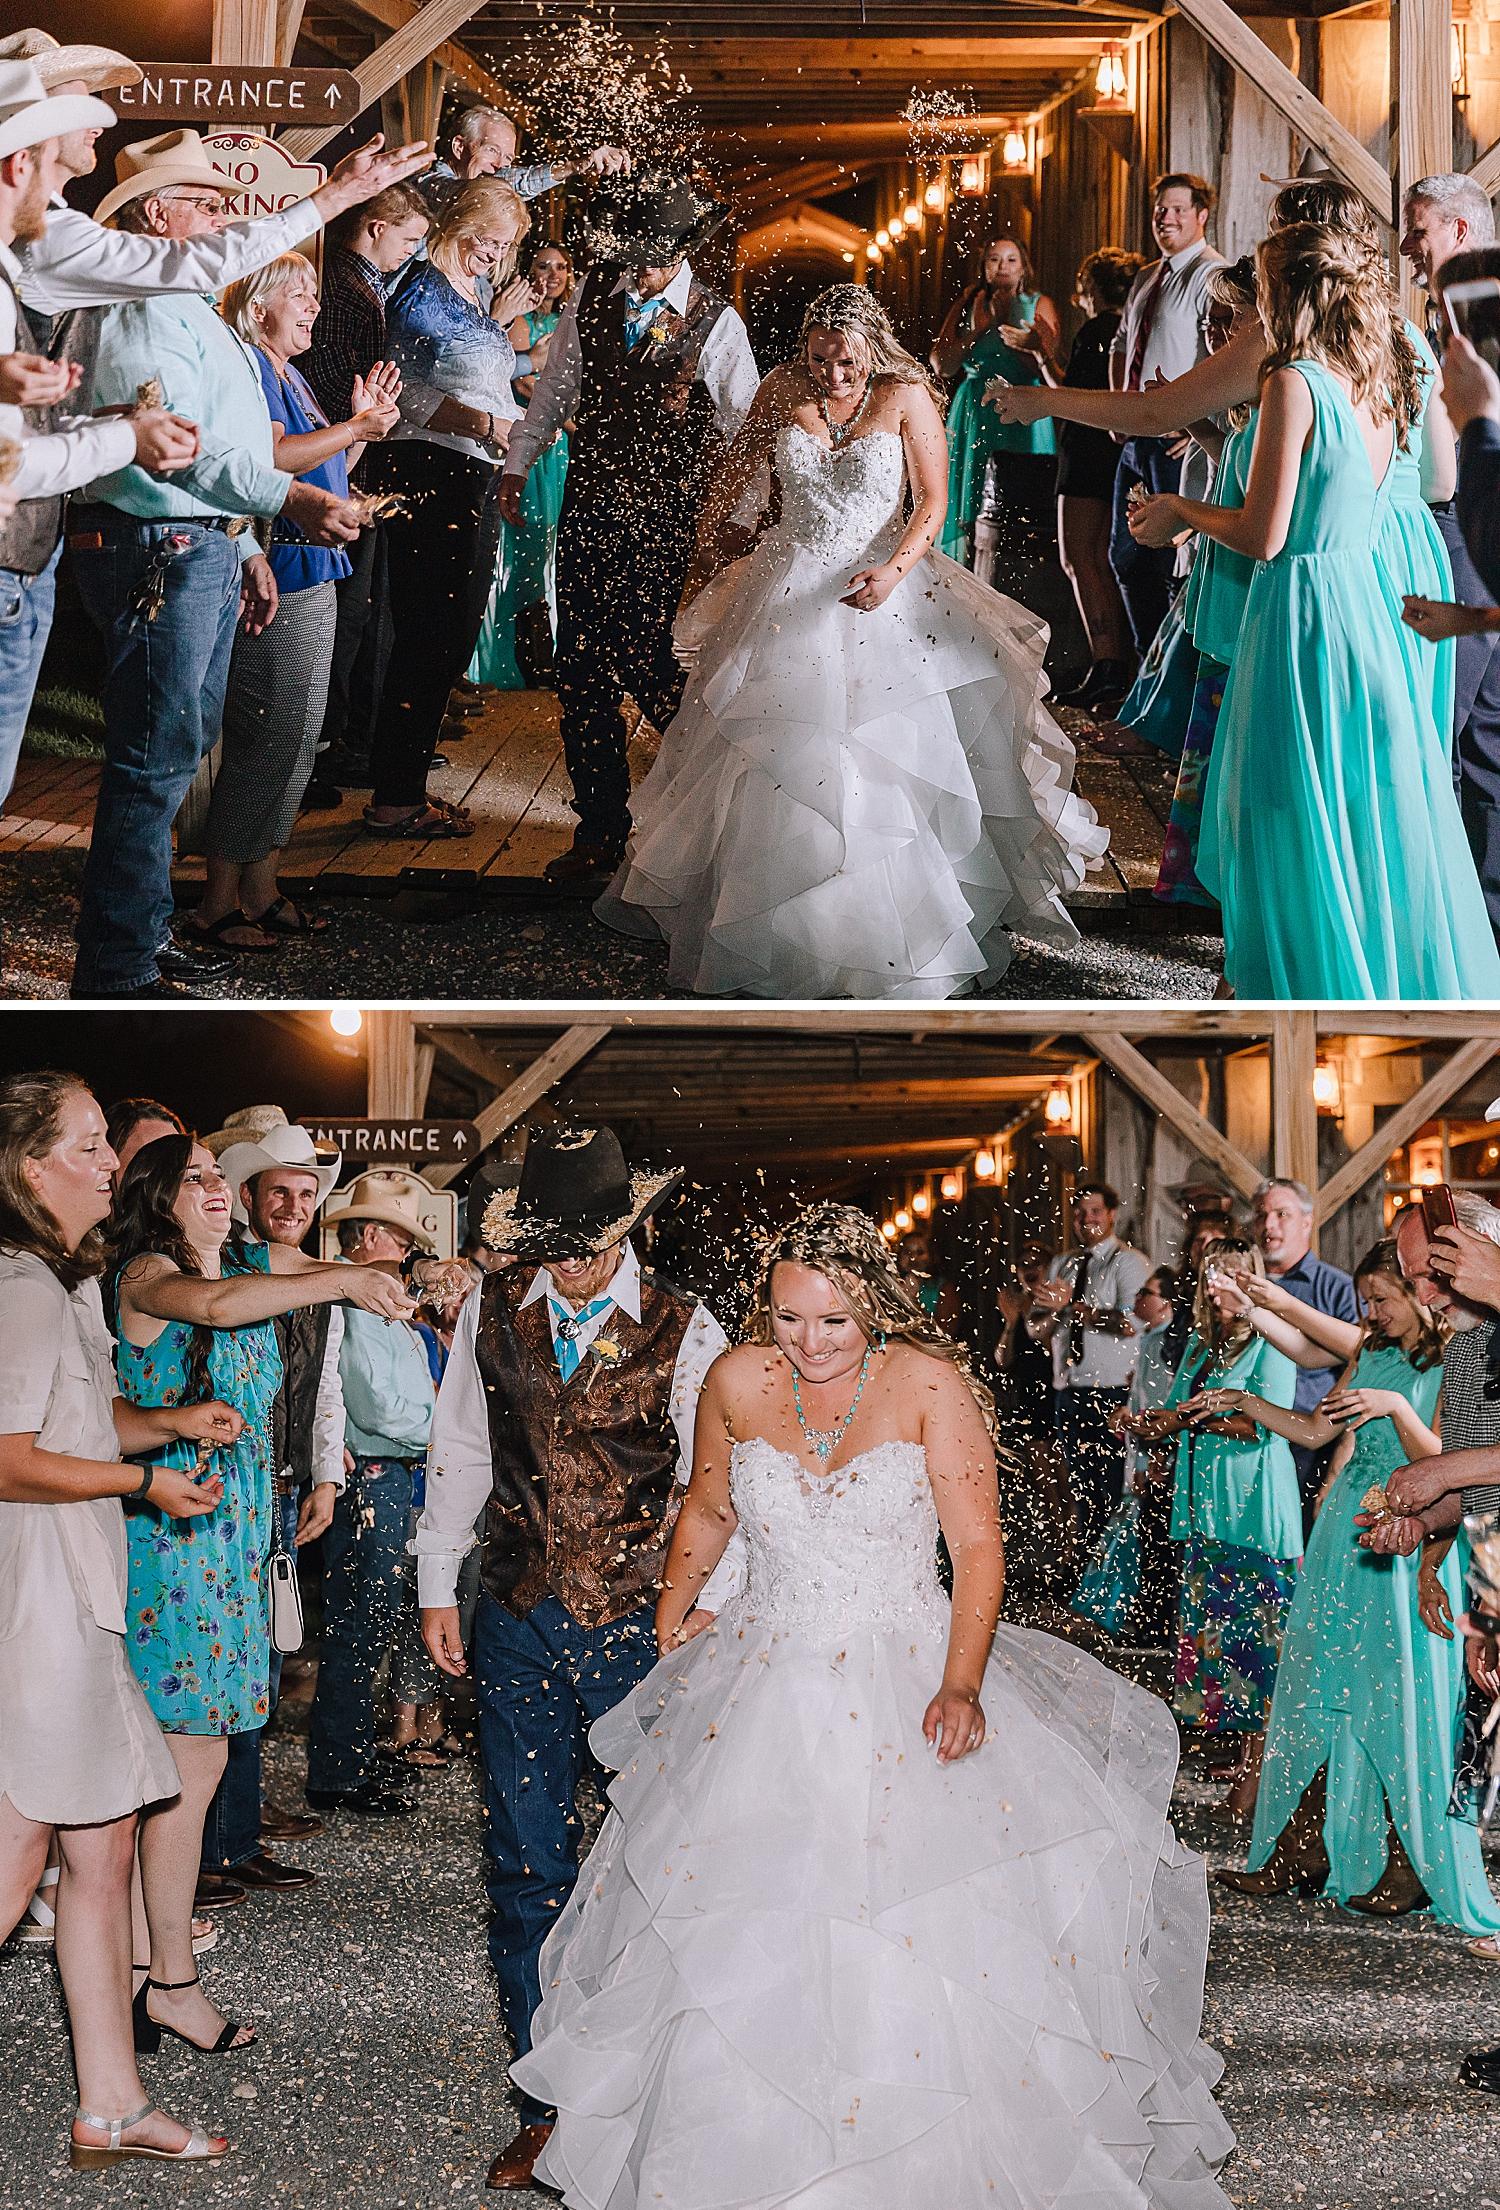 Carly-Barton-Photography-Old-Town-Texas-Rustic-Wedding-Photos-Sunflowers-Boots-Kyle-Texas_0114.jpg